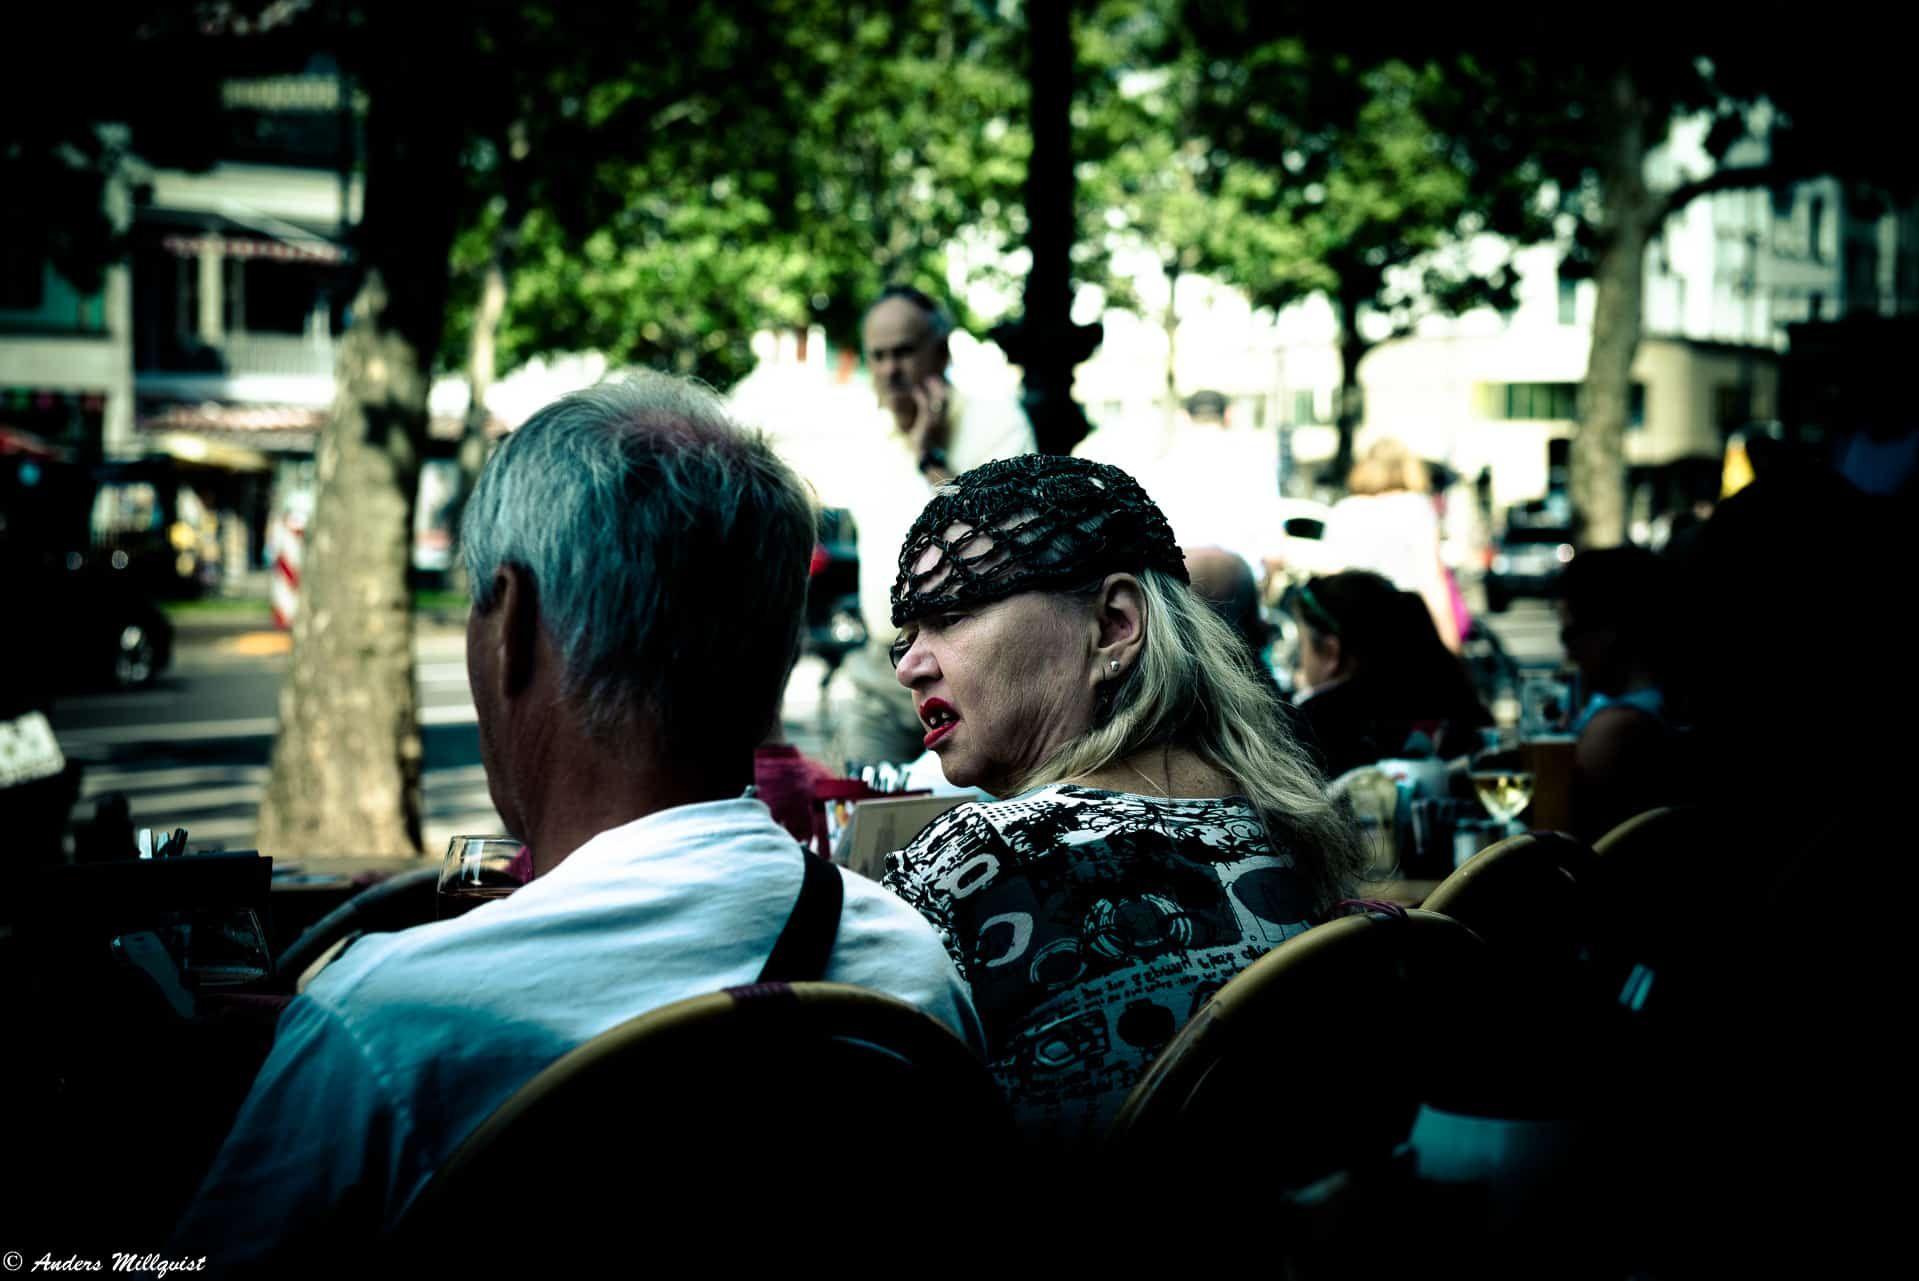 A woman in Berlin (heavy edit) - https://millqvist.se/wp-content/uploads/D17_20170728-31_043-2.jpg - https://millqvist.se/?p=555